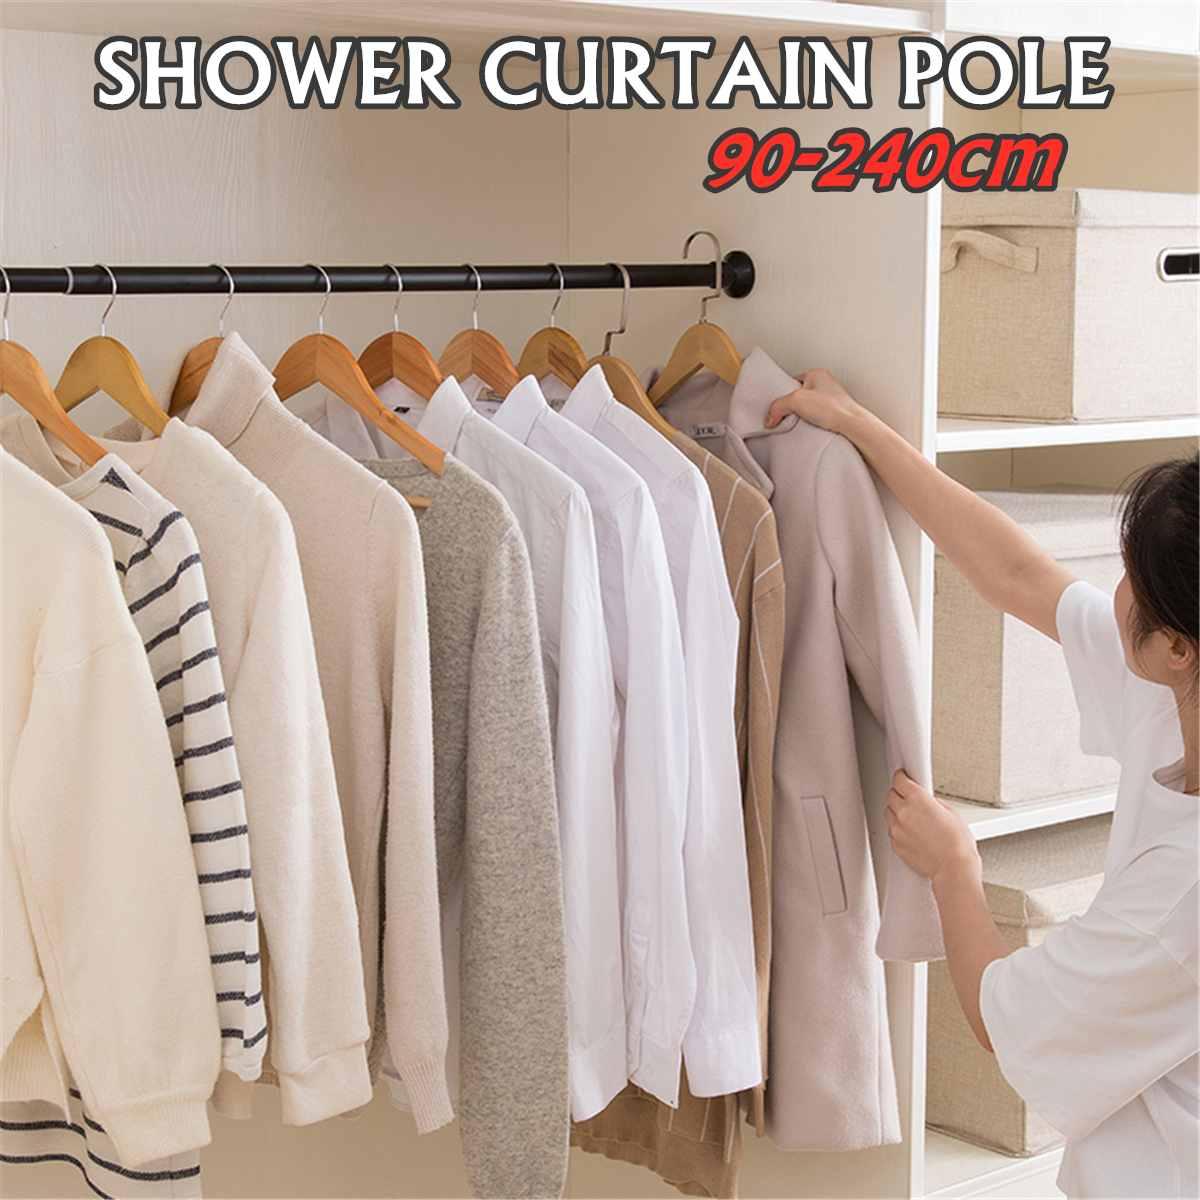 Multifunction Telescopic Shower Curtain Rods Window Rail 90-240cm Extendable Wardrobe Pole Rod Stainless Steel Bathroom Kitchen